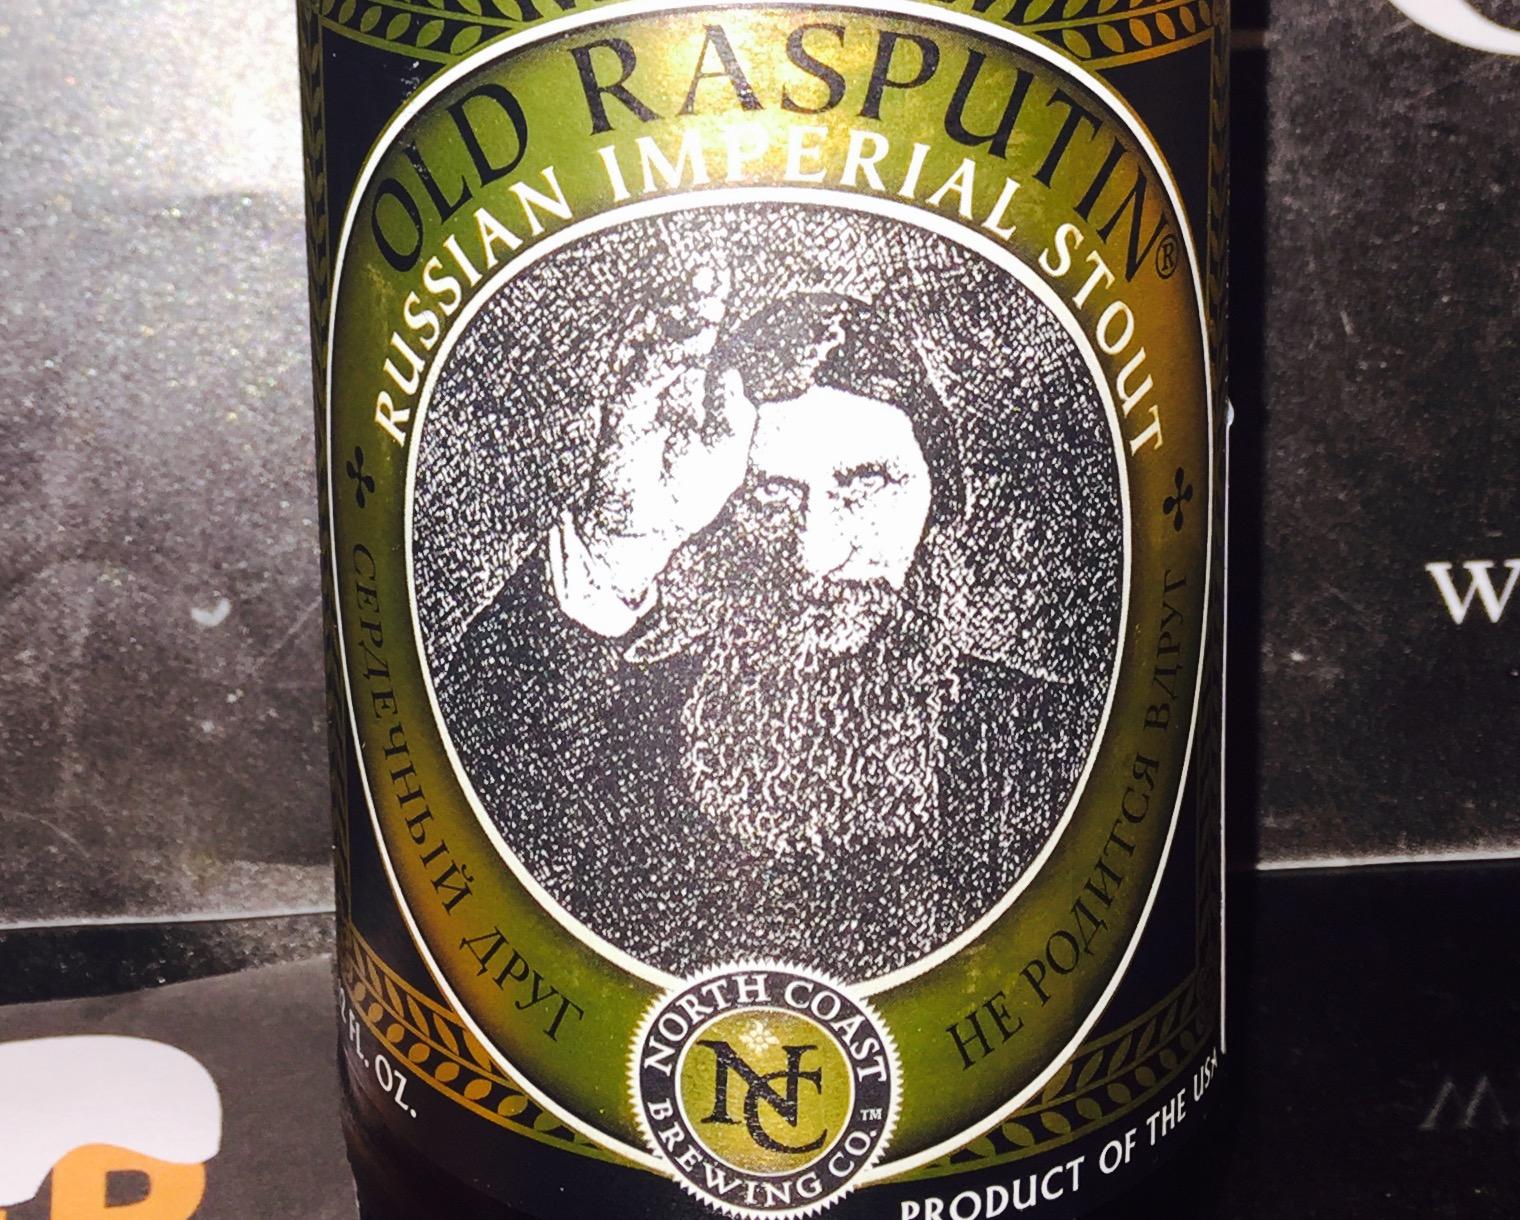 Old Rasputin - Russian Imperial Stout